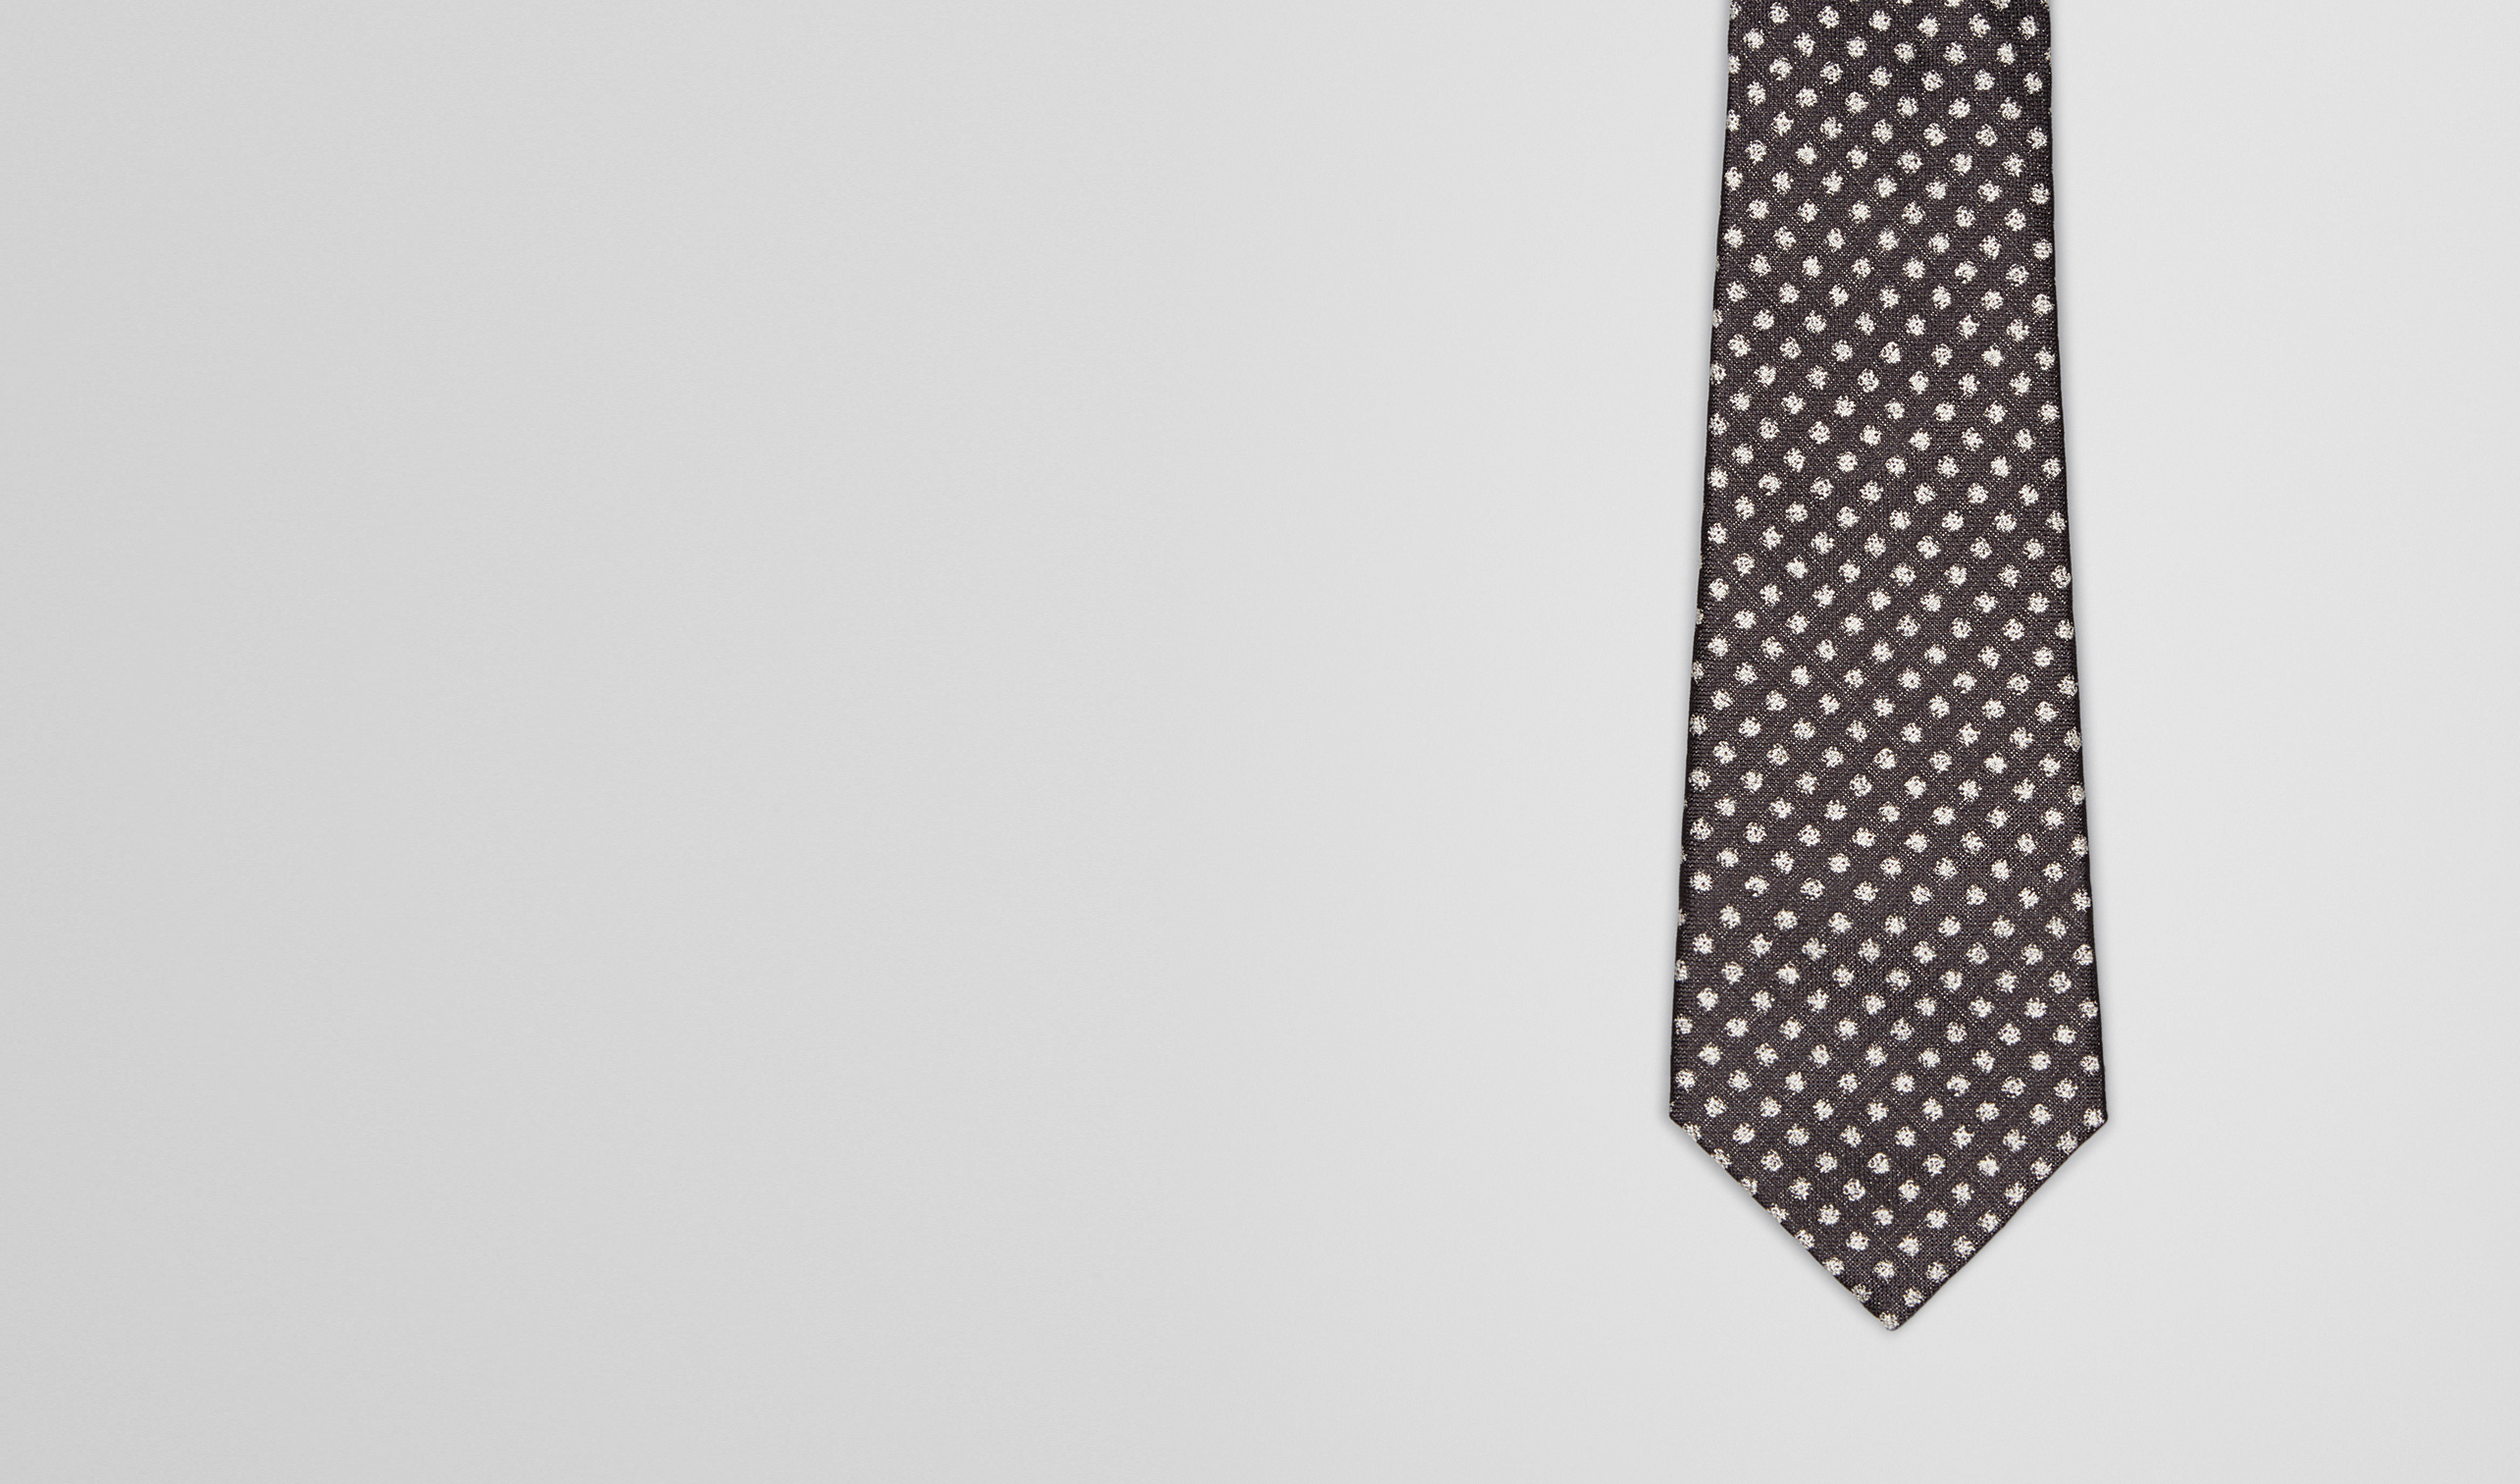 BOTTEGA VENETA Krawatte U SEIDENKRAWATTE BLACK UND BEIGE pl